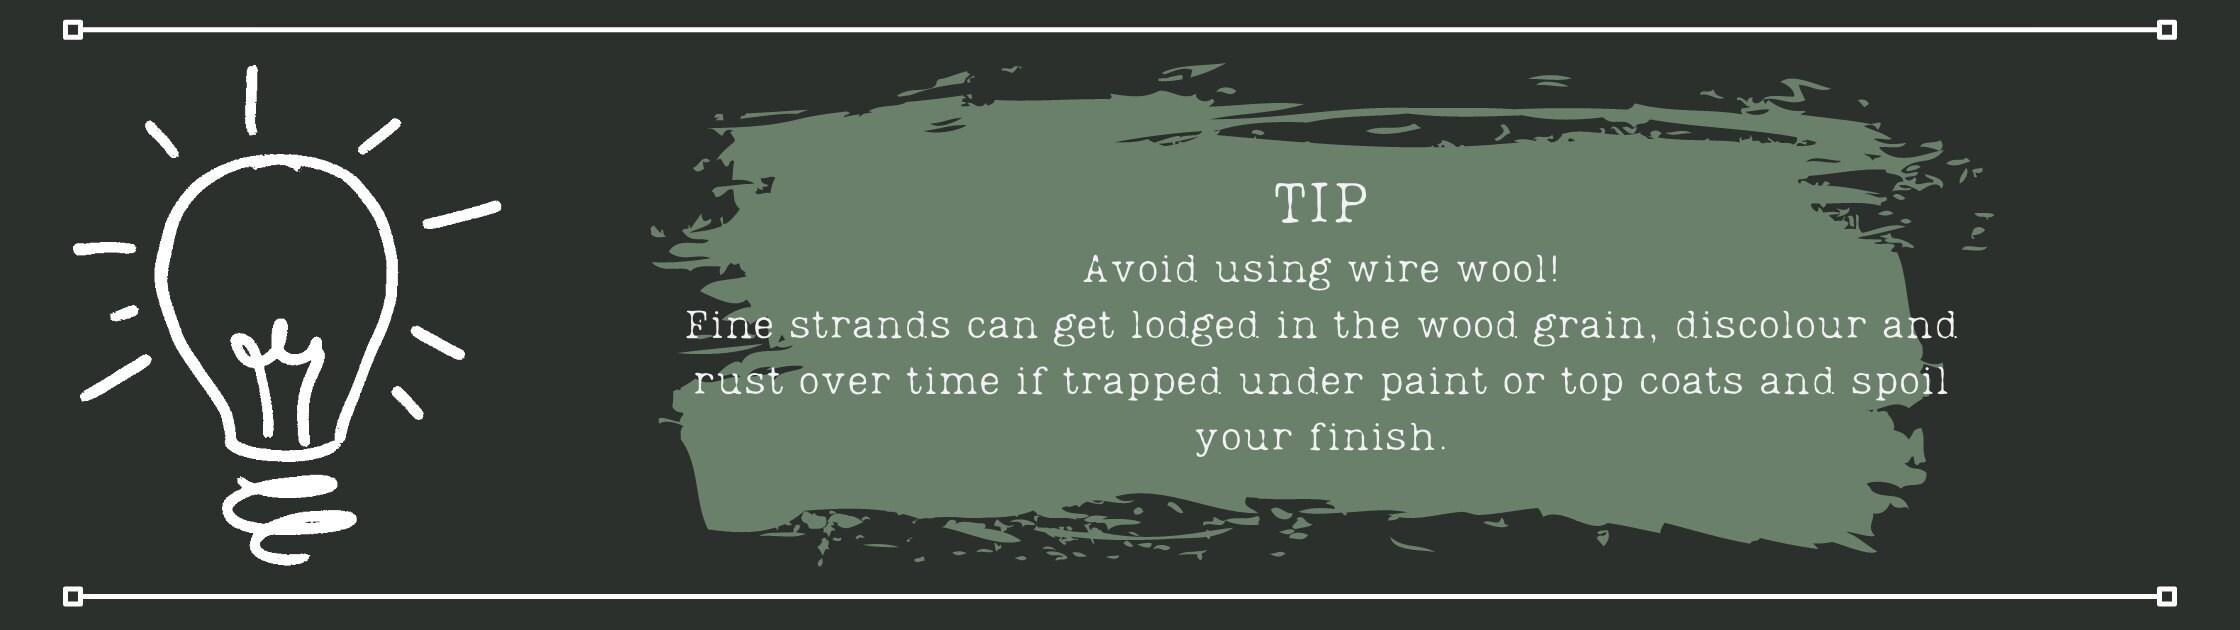 Avoid using wire wool